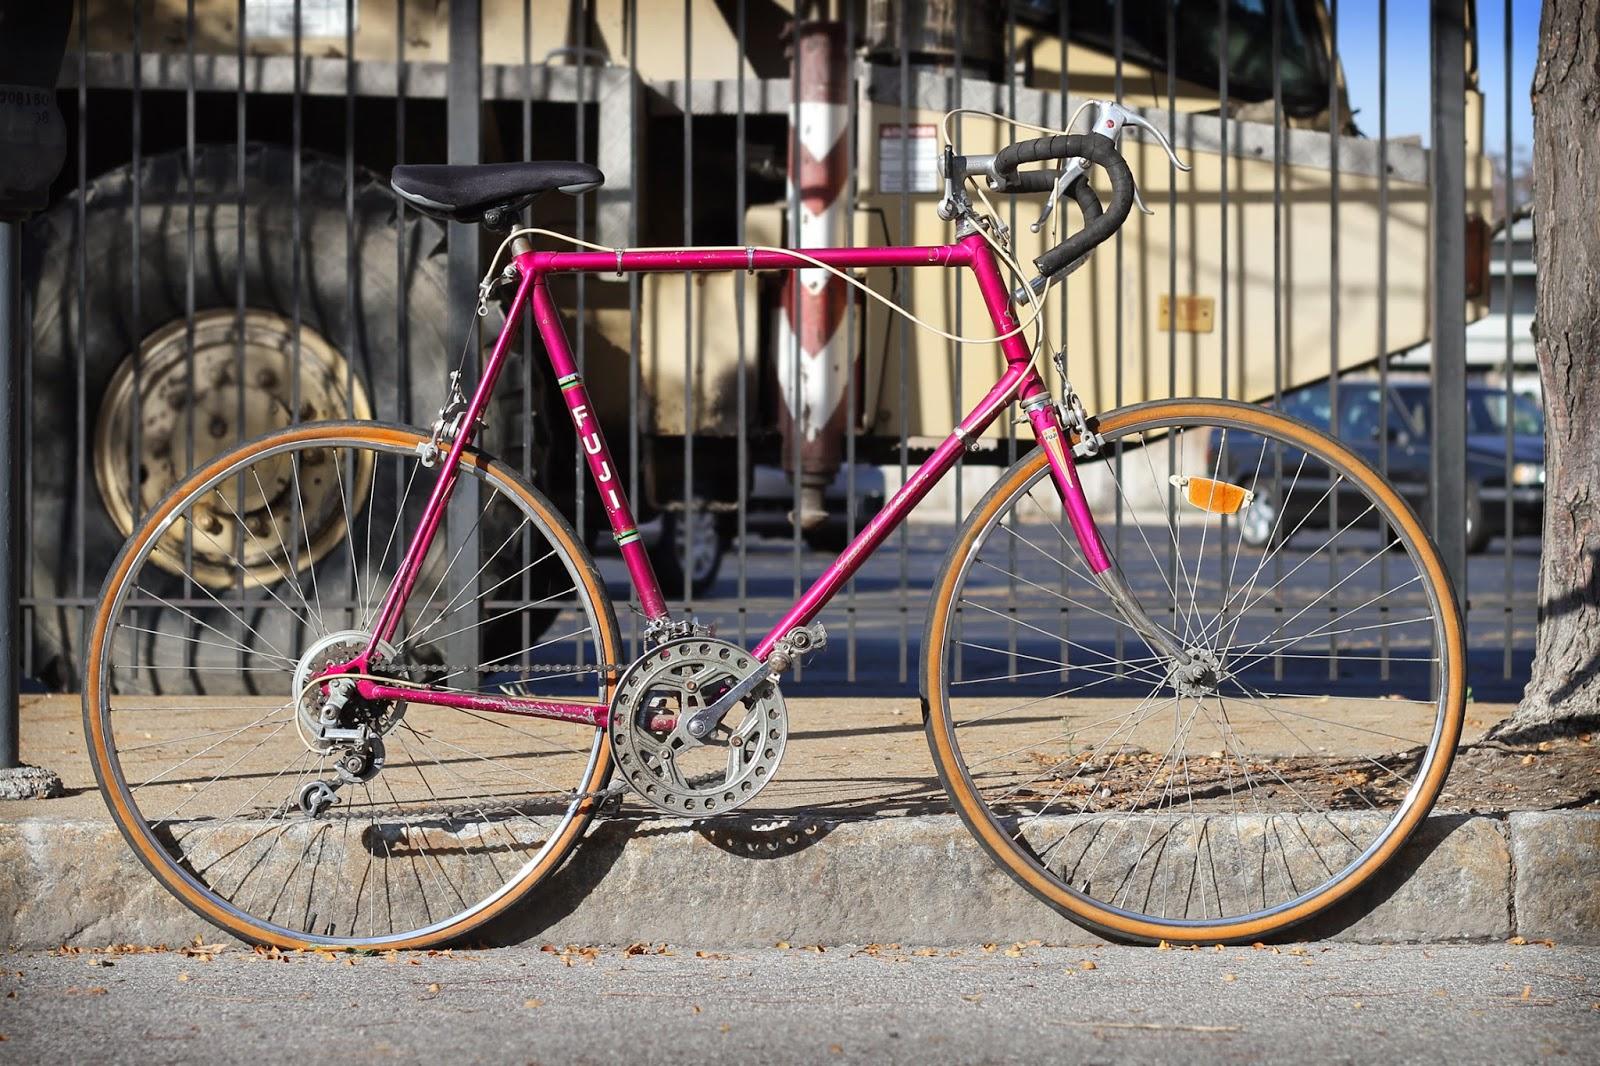 Bikes For No Reason: 1975 Fuji Special Tourer Part I